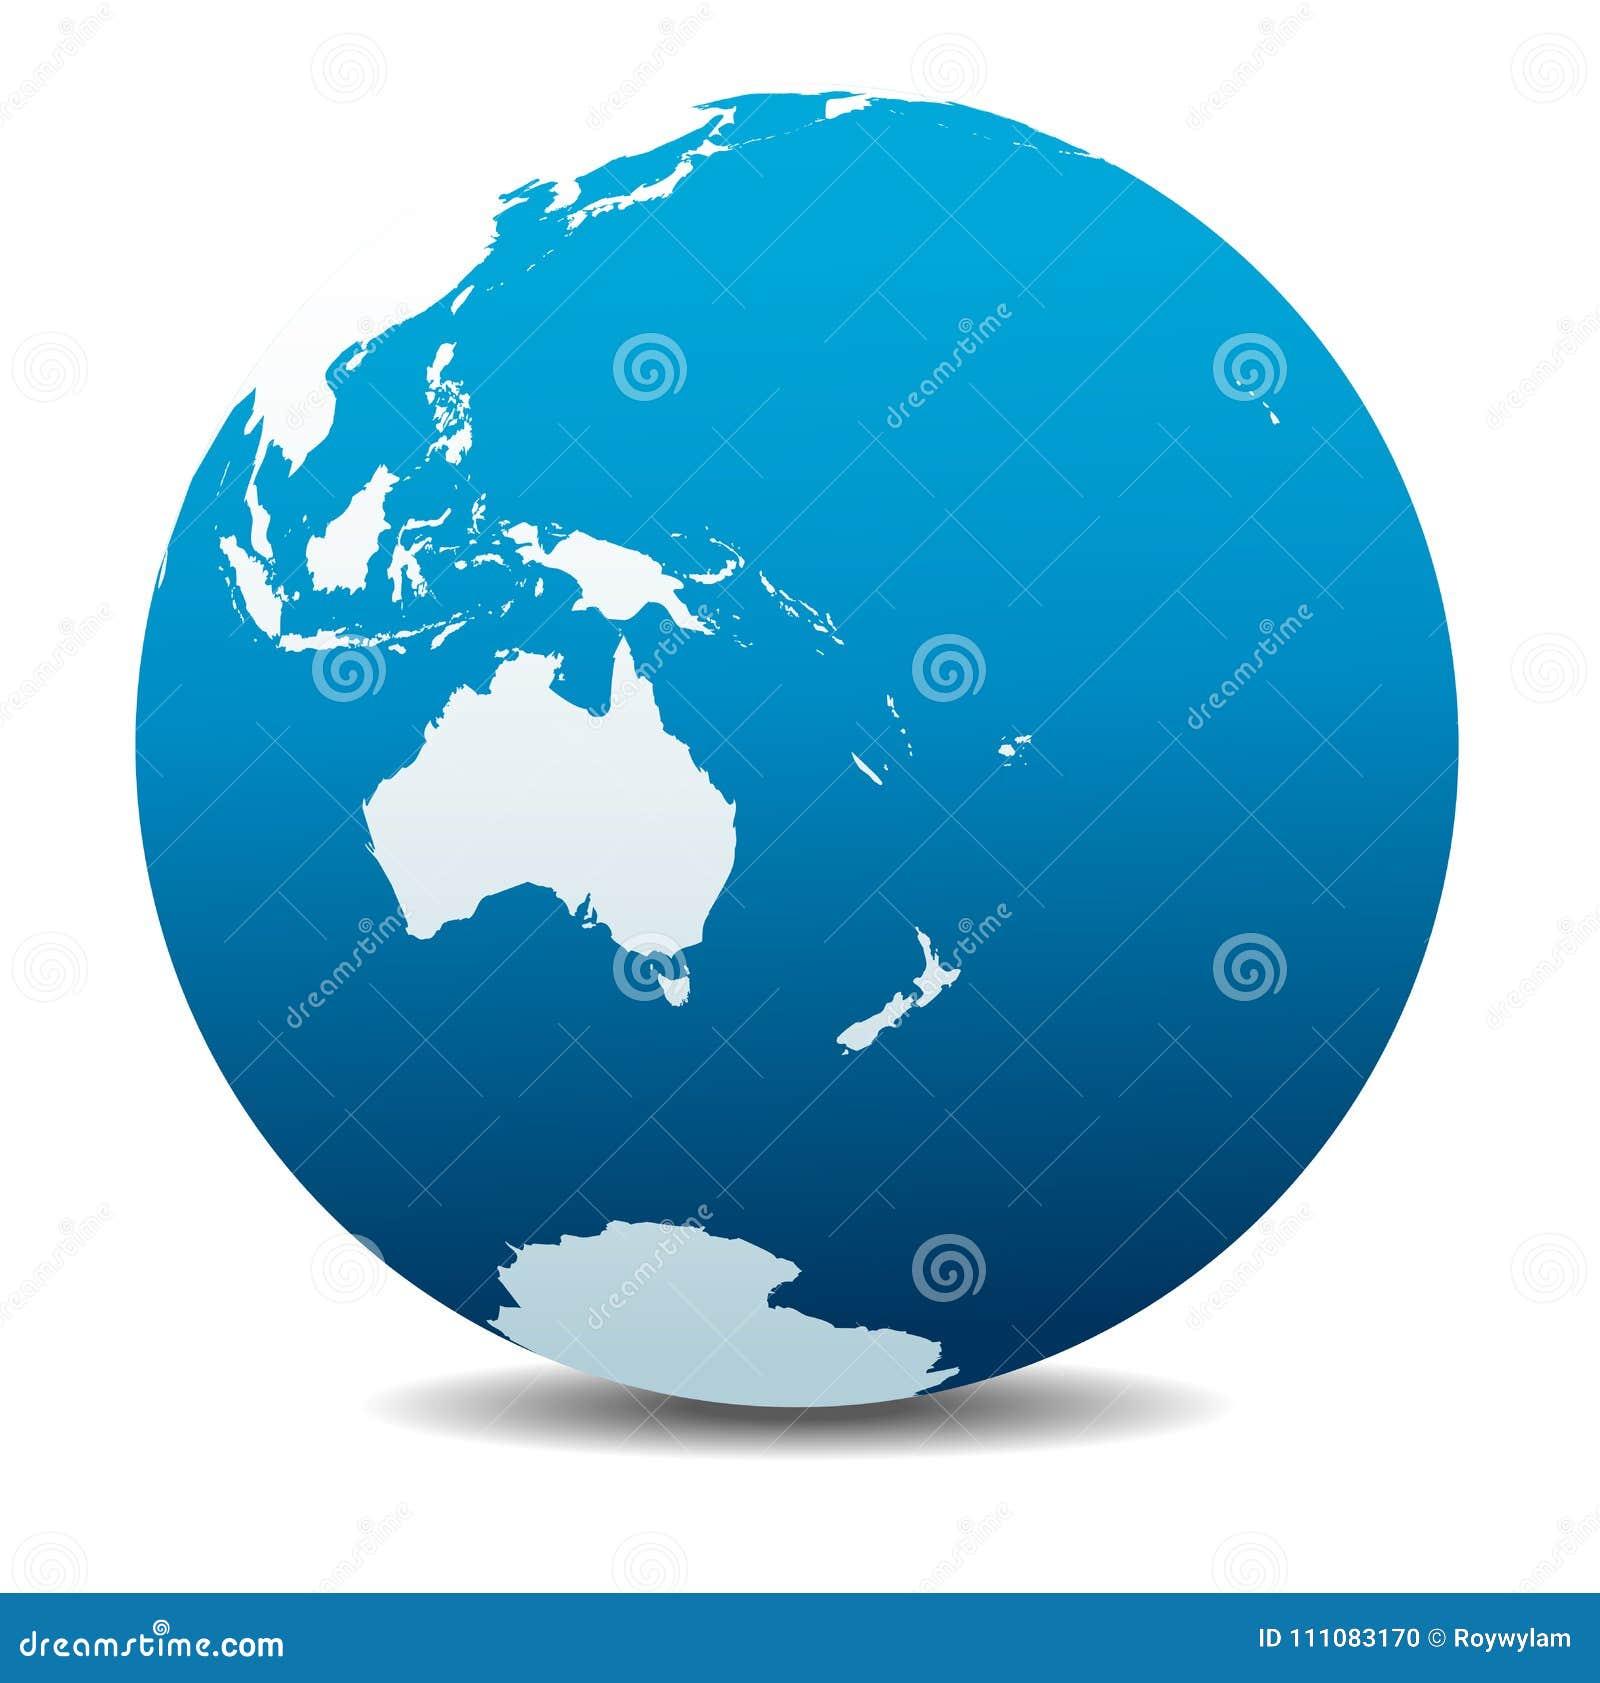 australia and new zealand icon of the world globe